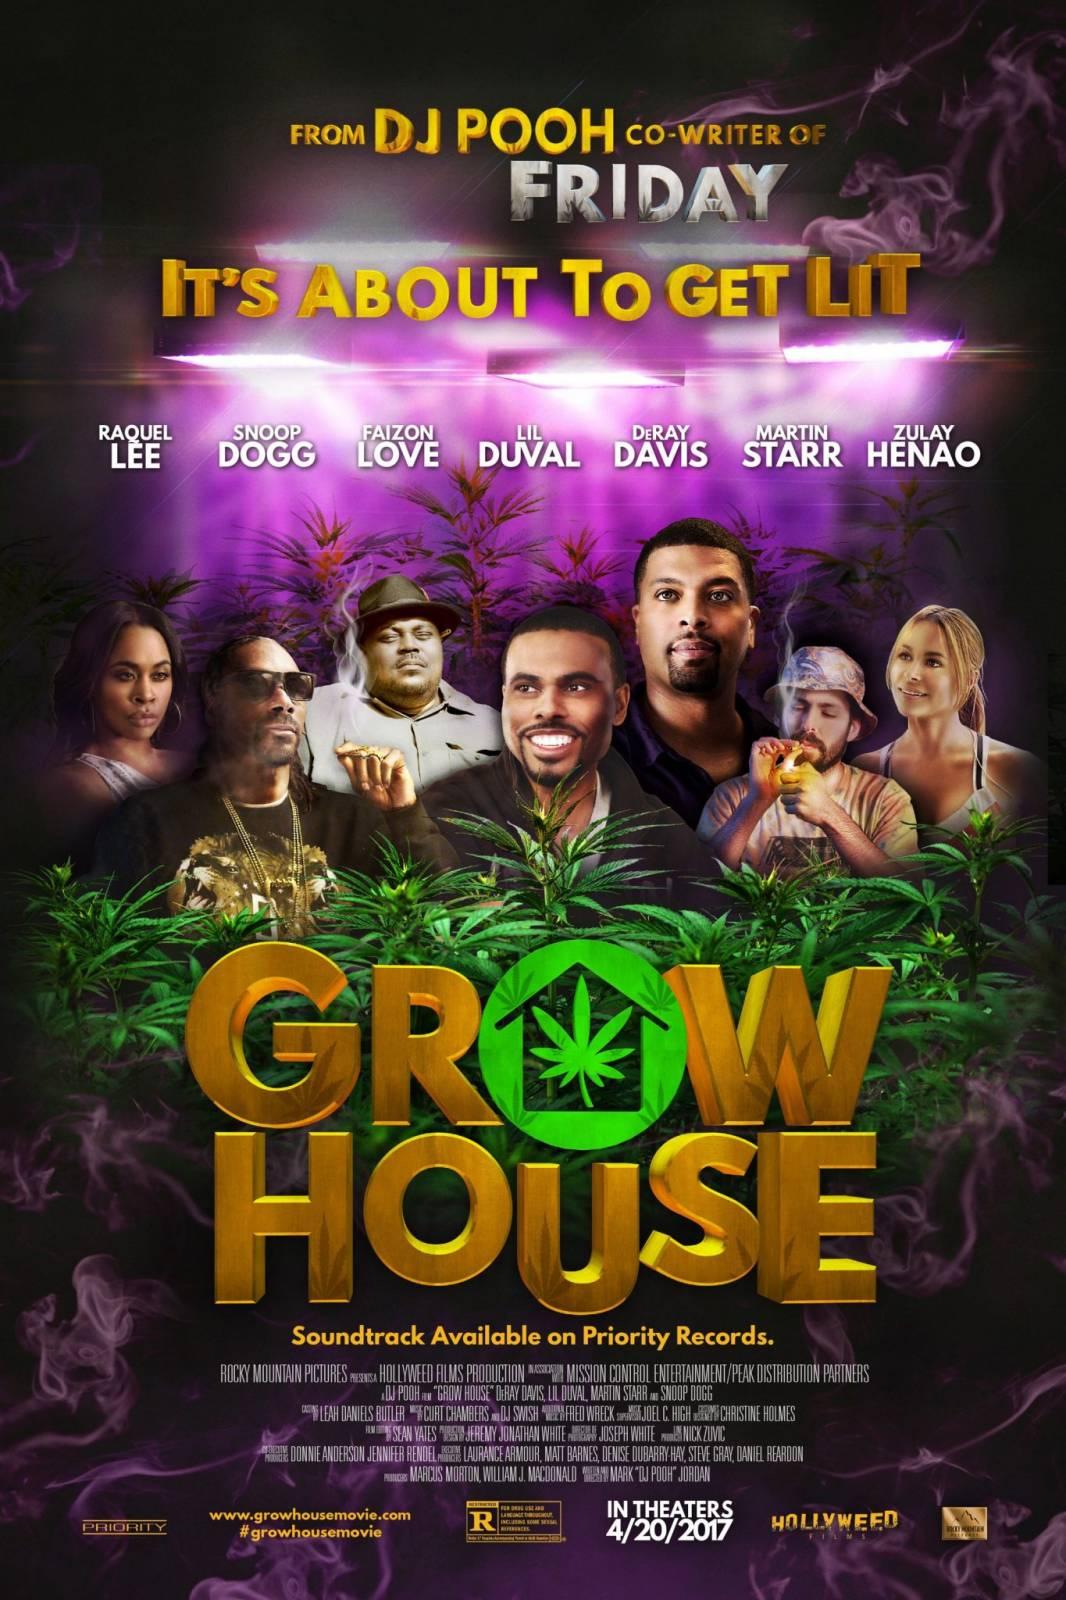 """Grow House"" – 420 Film starring Snoop Dogg, DeRay Davis, Lil' Duval [Video]"